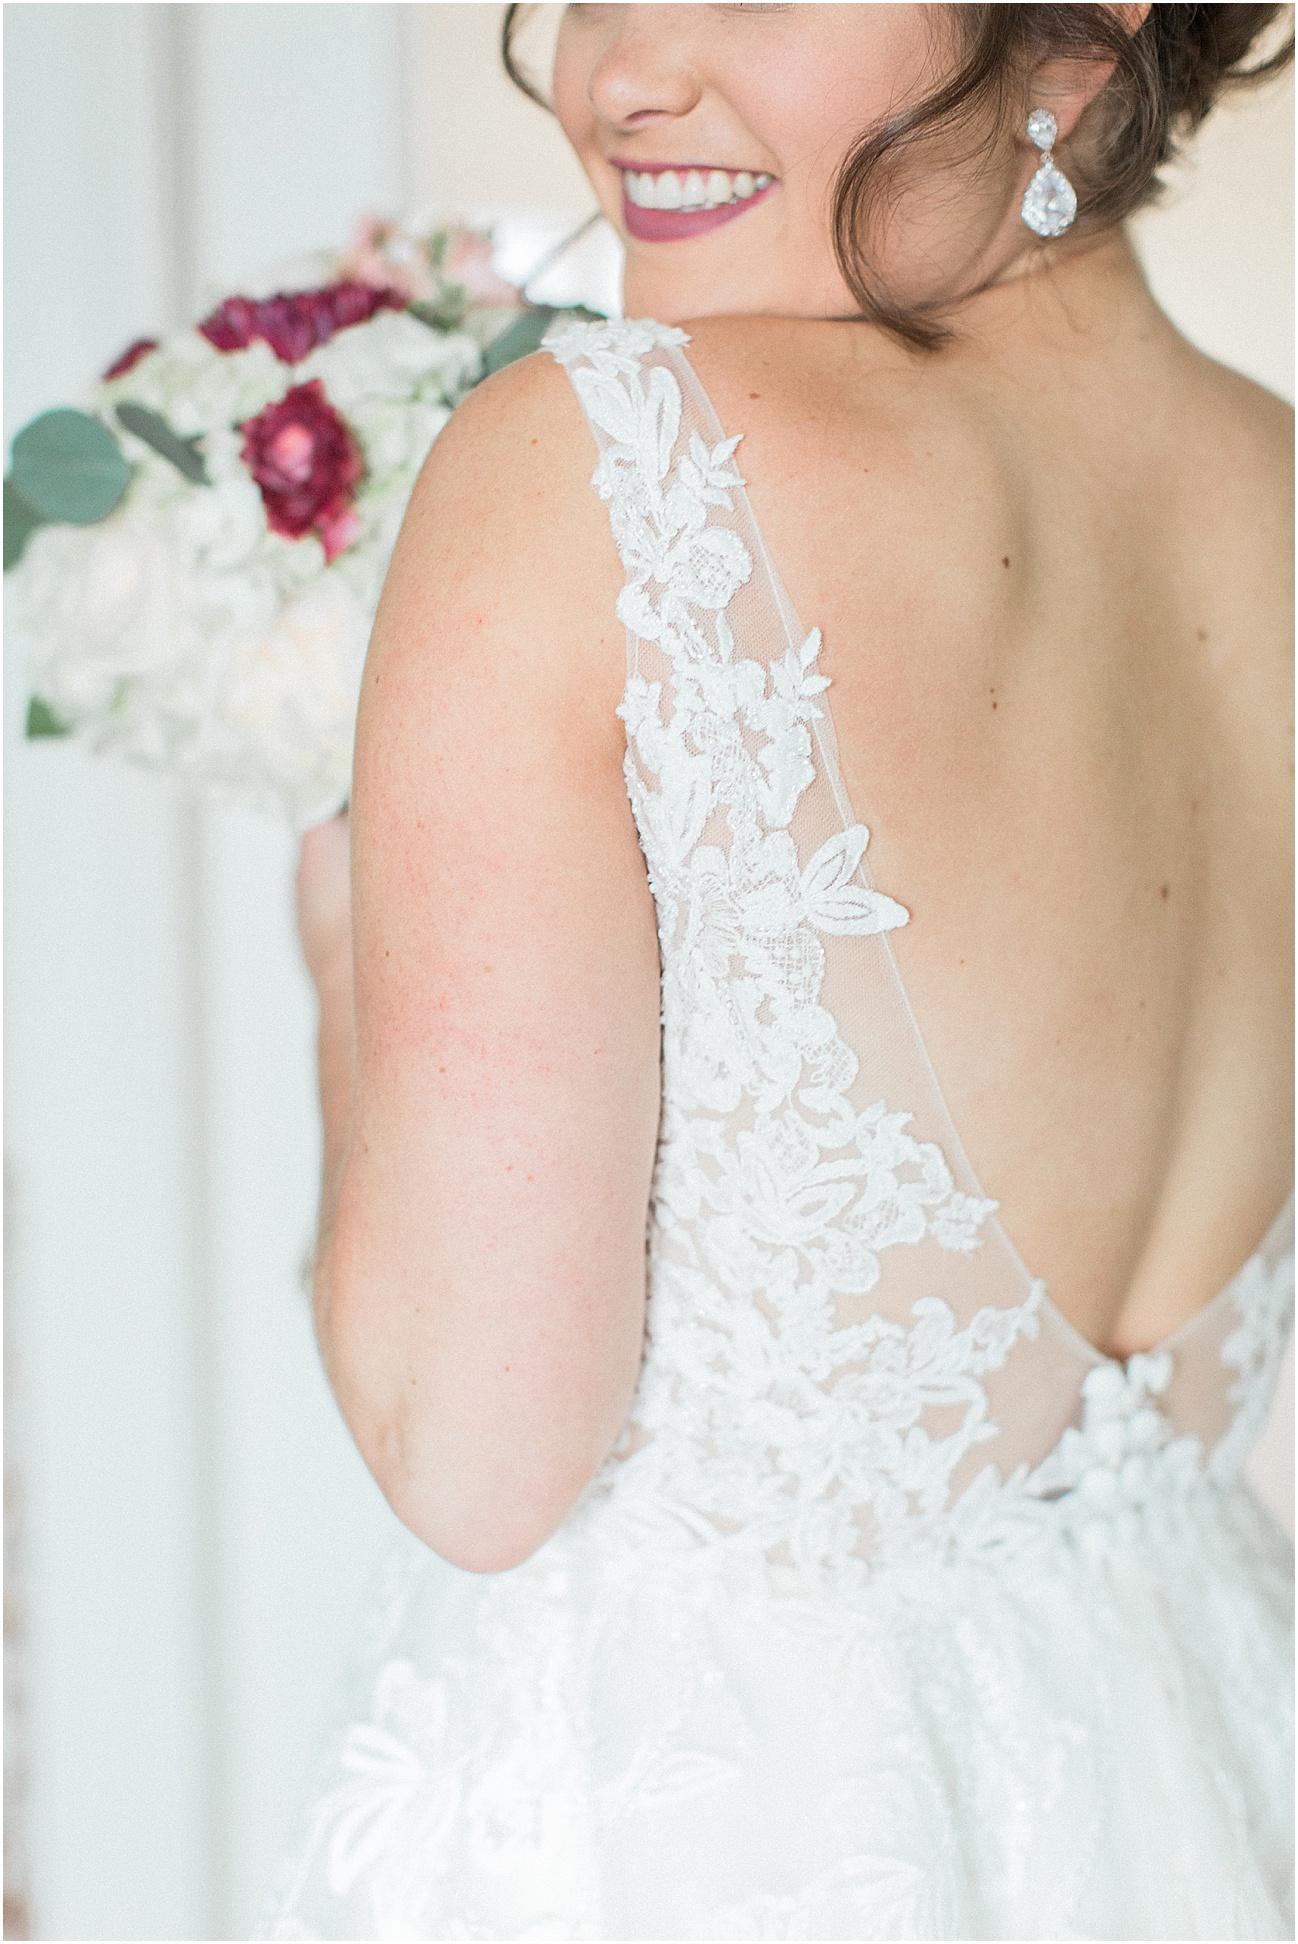 shannon_daniel_dan_atlantic_resort_saint_marys_st_mary_church_fall_newport_catholic_irish_cape_cod_boston_wedding_photographer_meredith_jane_photography_photo_1615.jpg